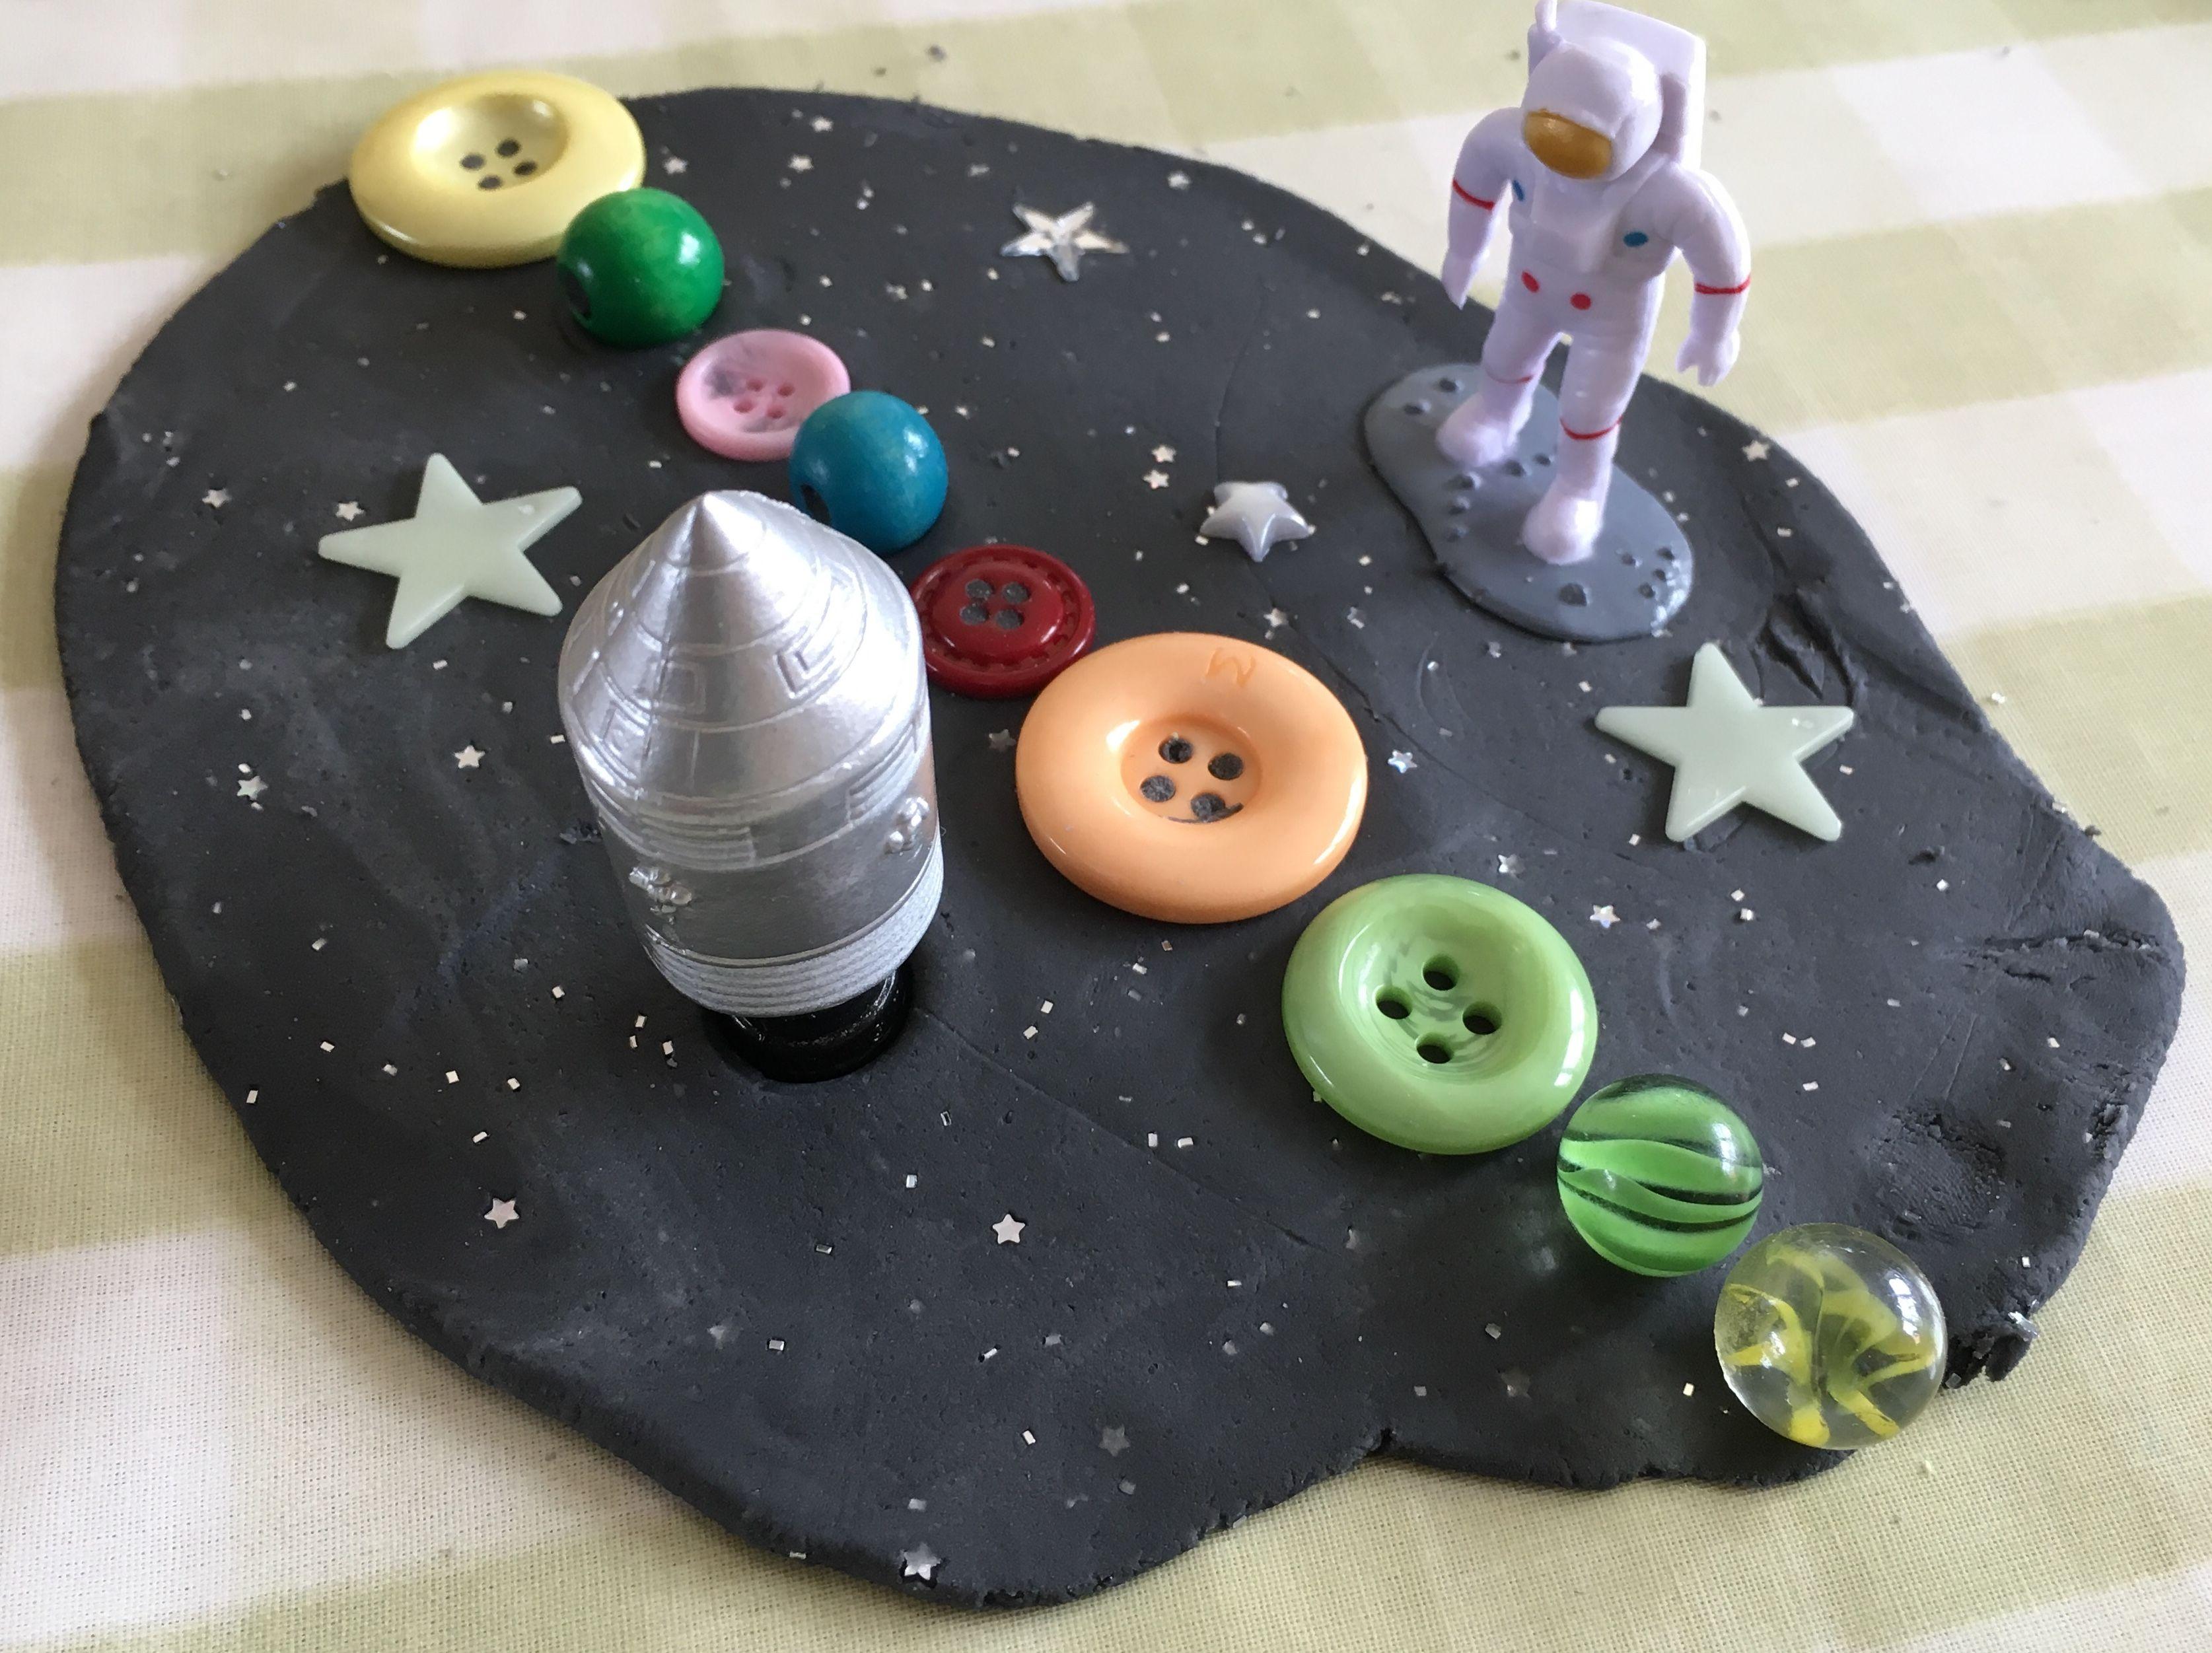 Space Play Dough Kit Etsy Playdough kits, Playdough